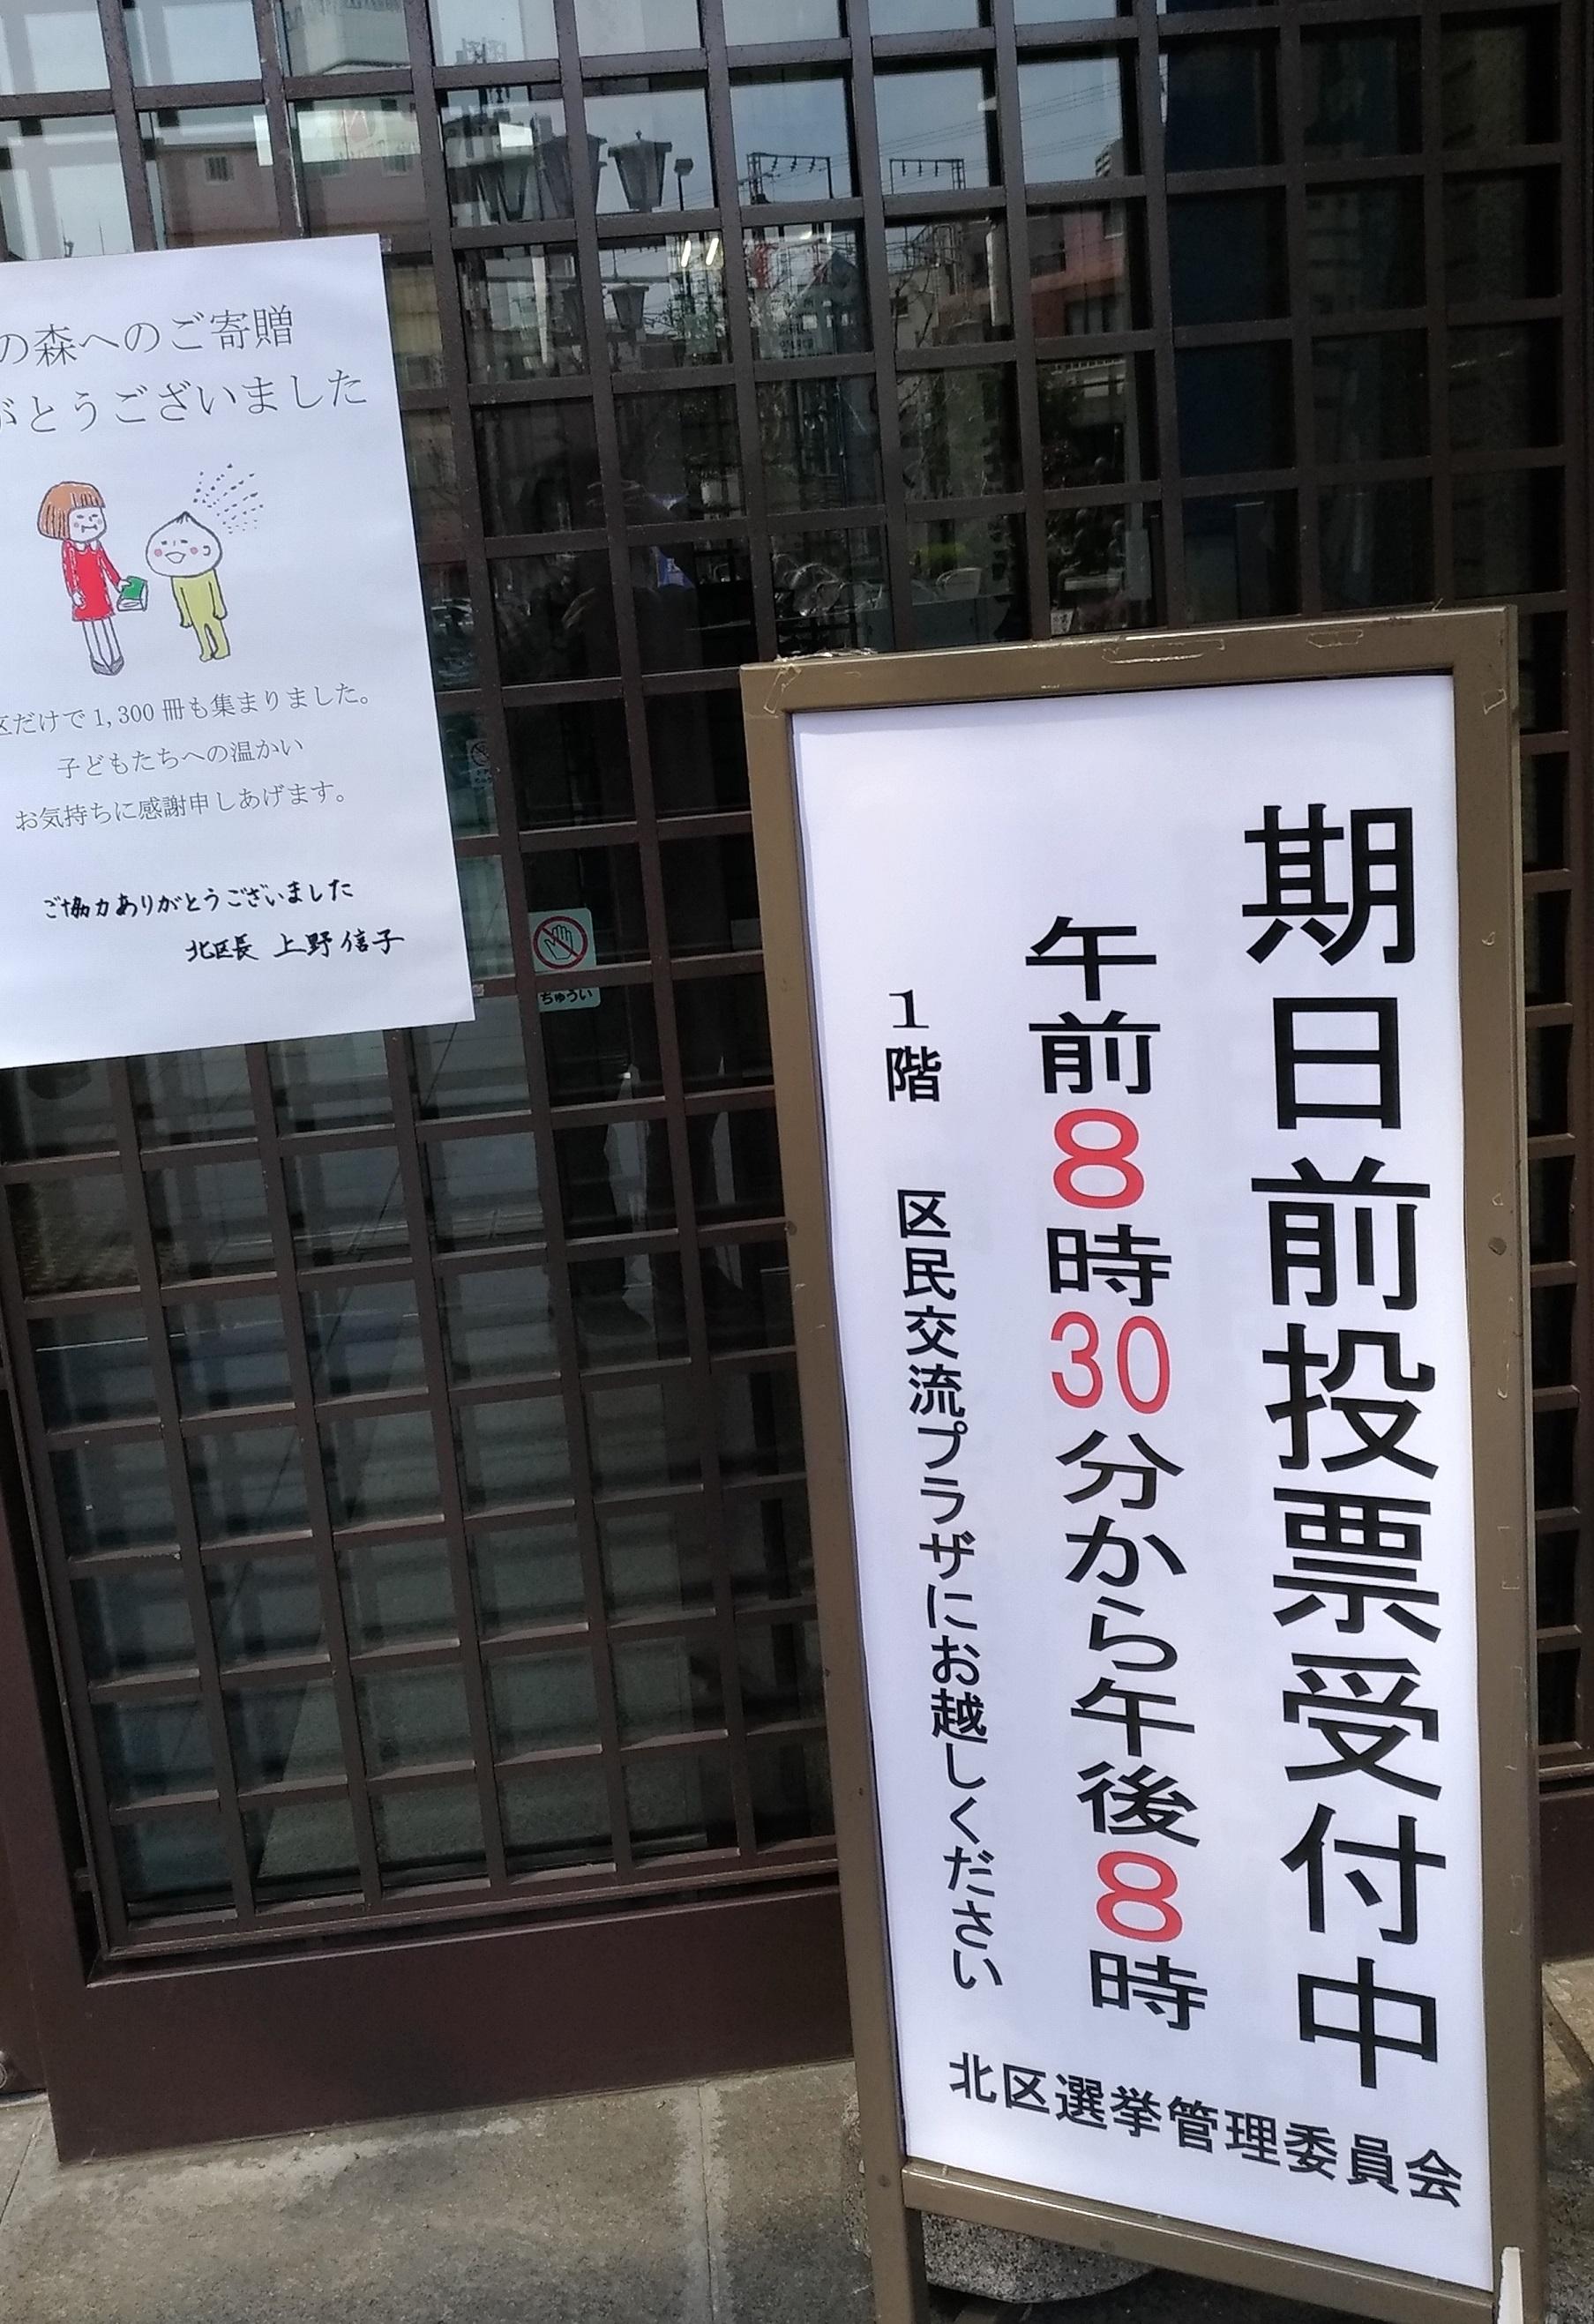 osaka_kijitumae_tohyo2019_2.jpg